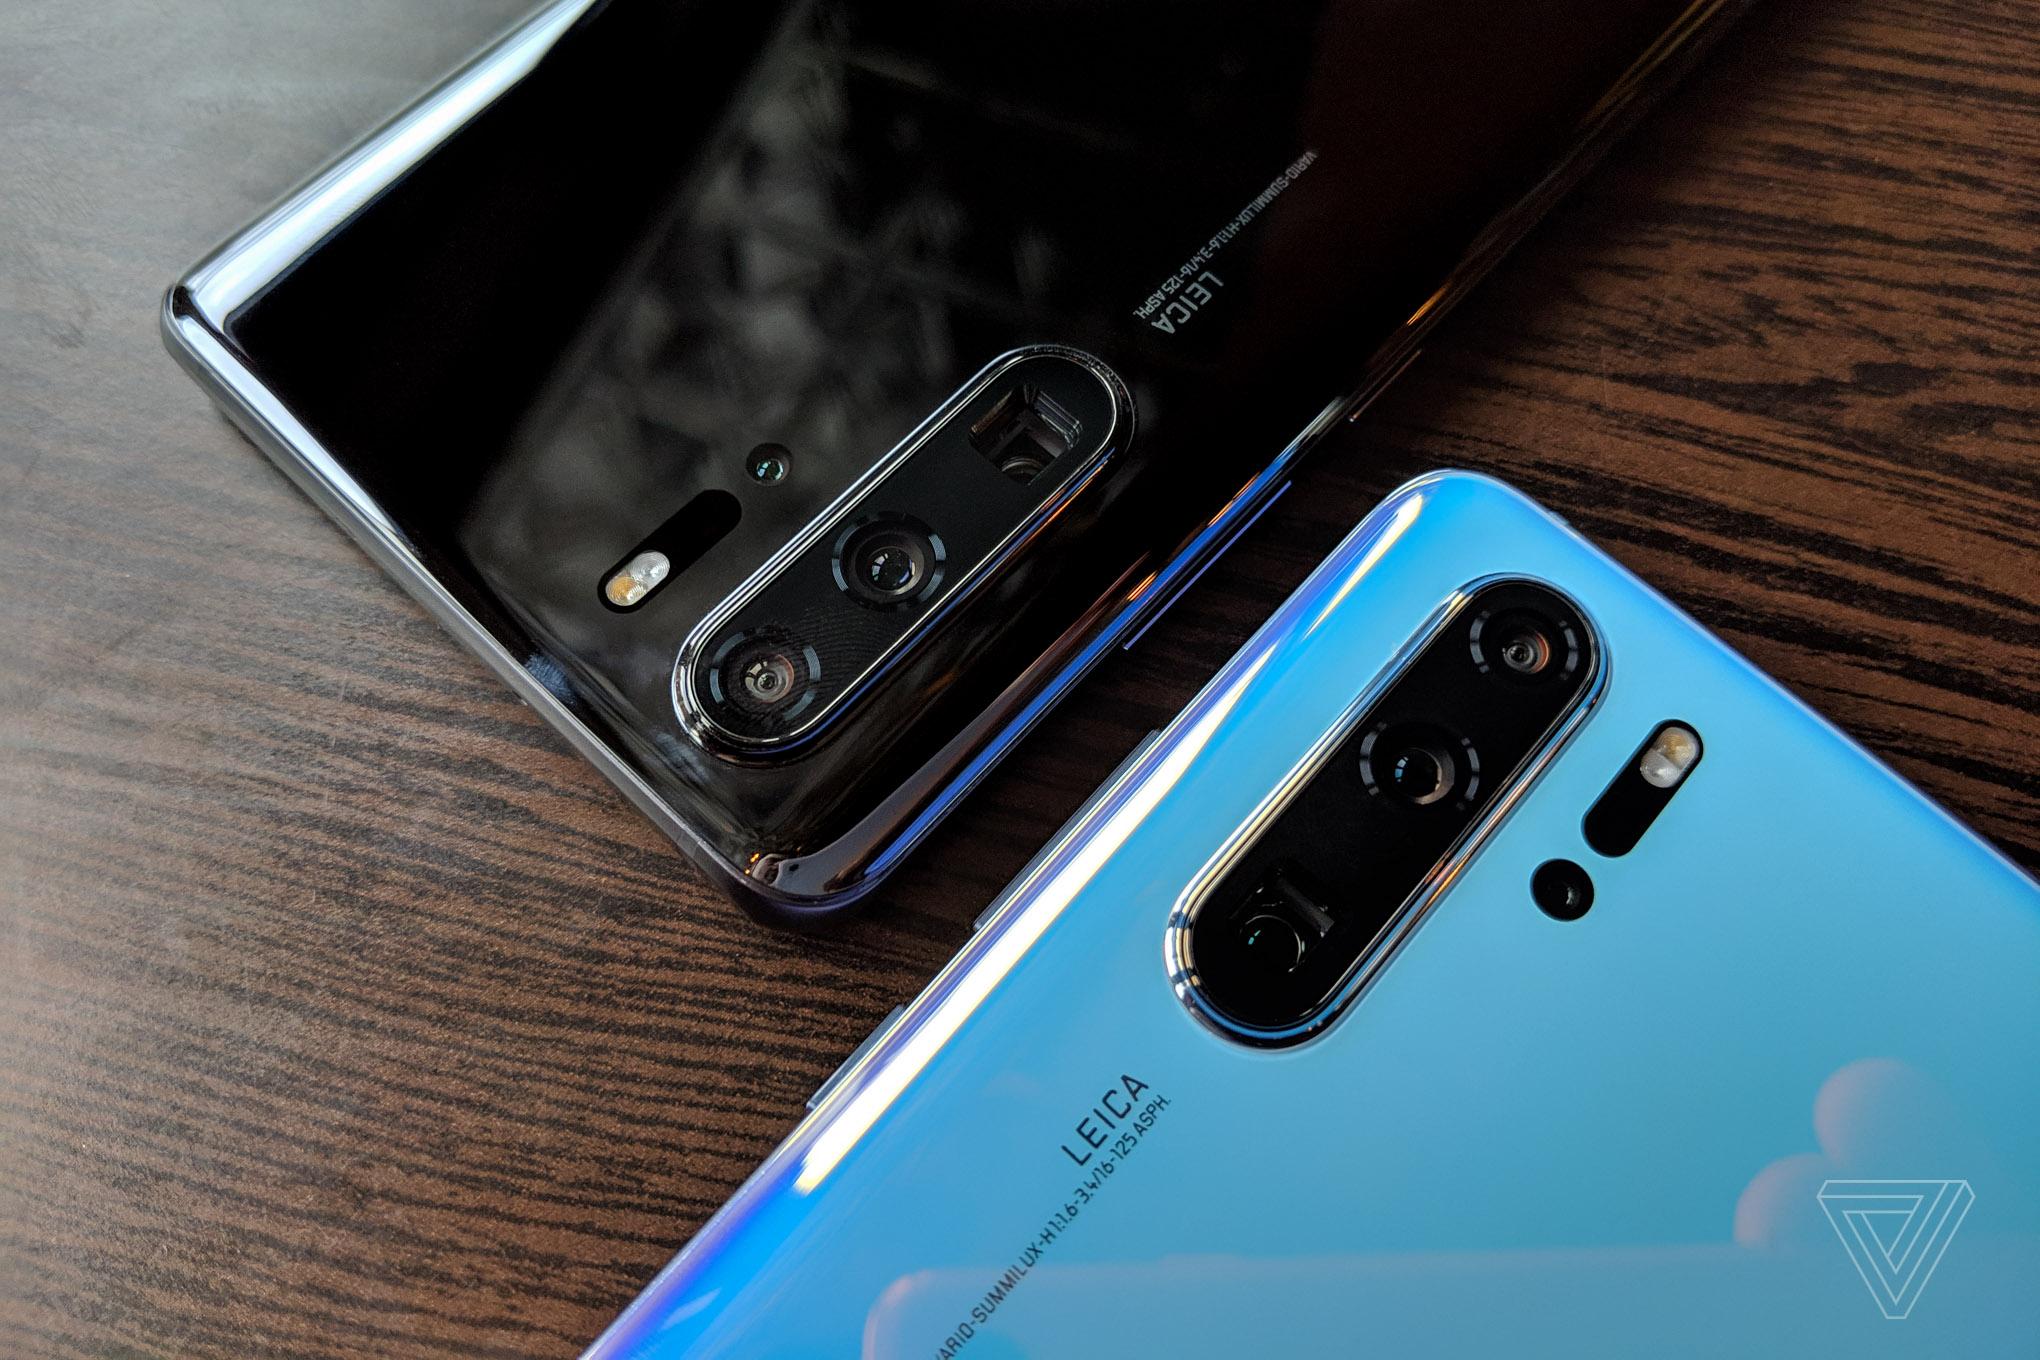 Huawei P30, P30 PRO, PRET, LANSARE, IMAGINI, NOUTATI, SPECIFICATII 2